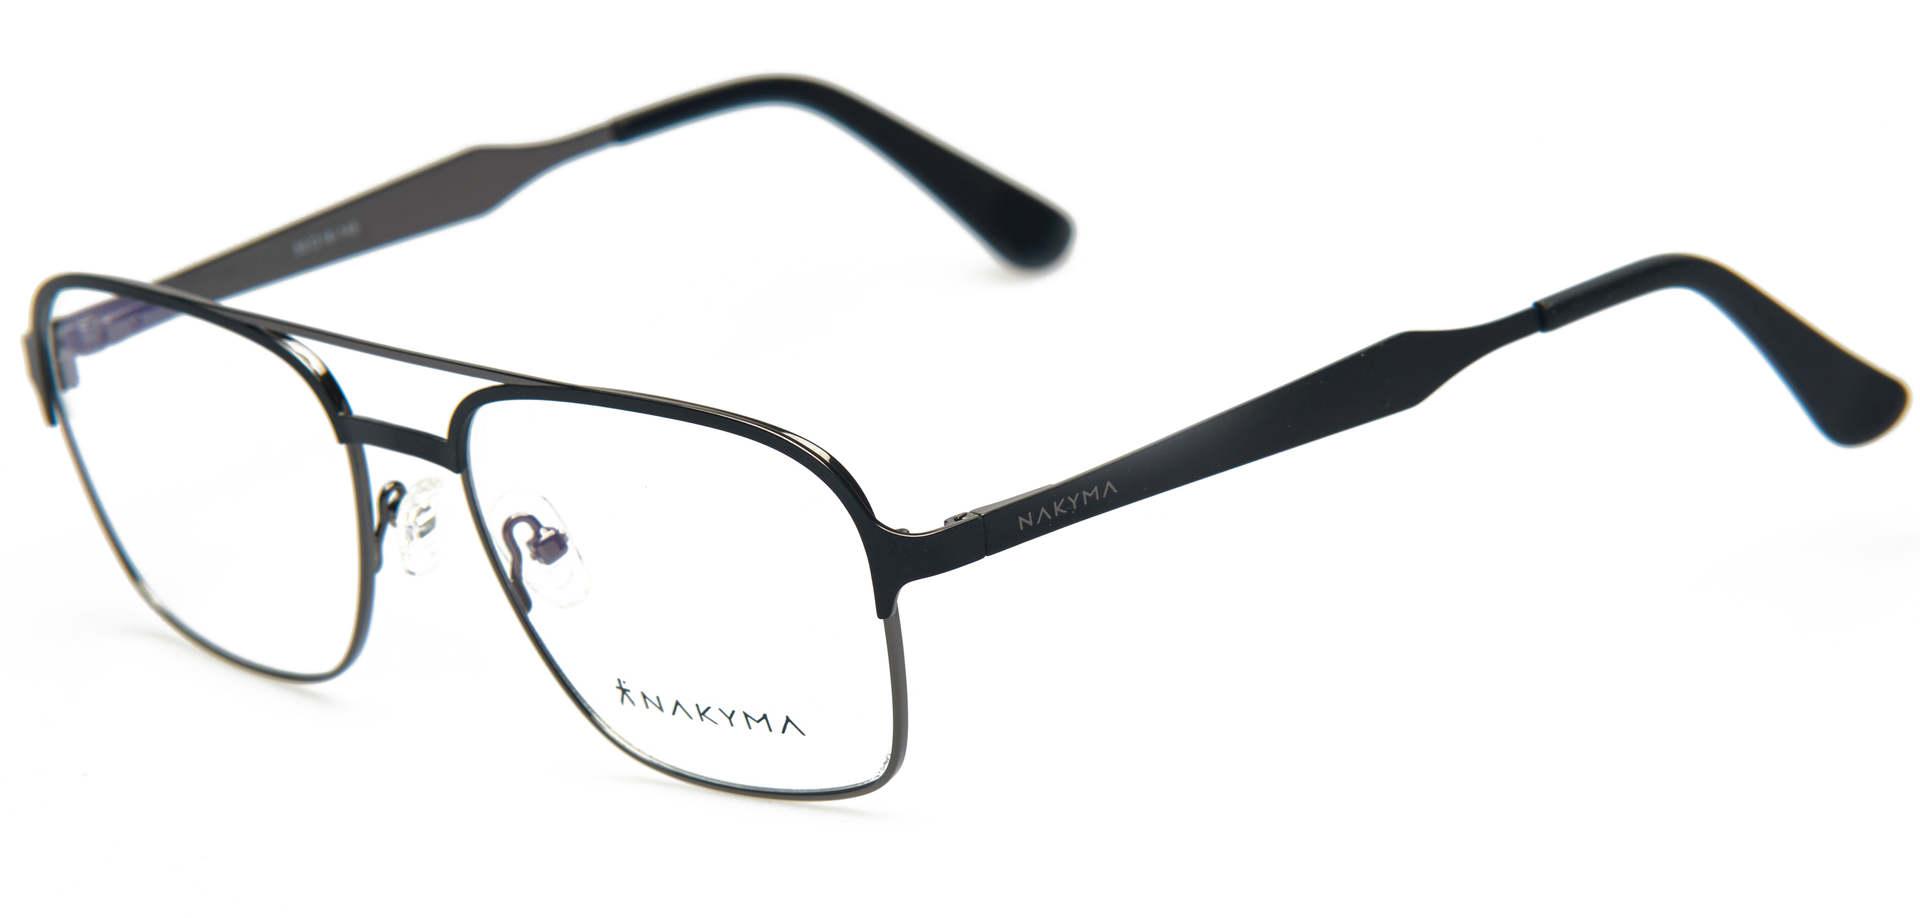 8R1-NAKYMA-V11-C1